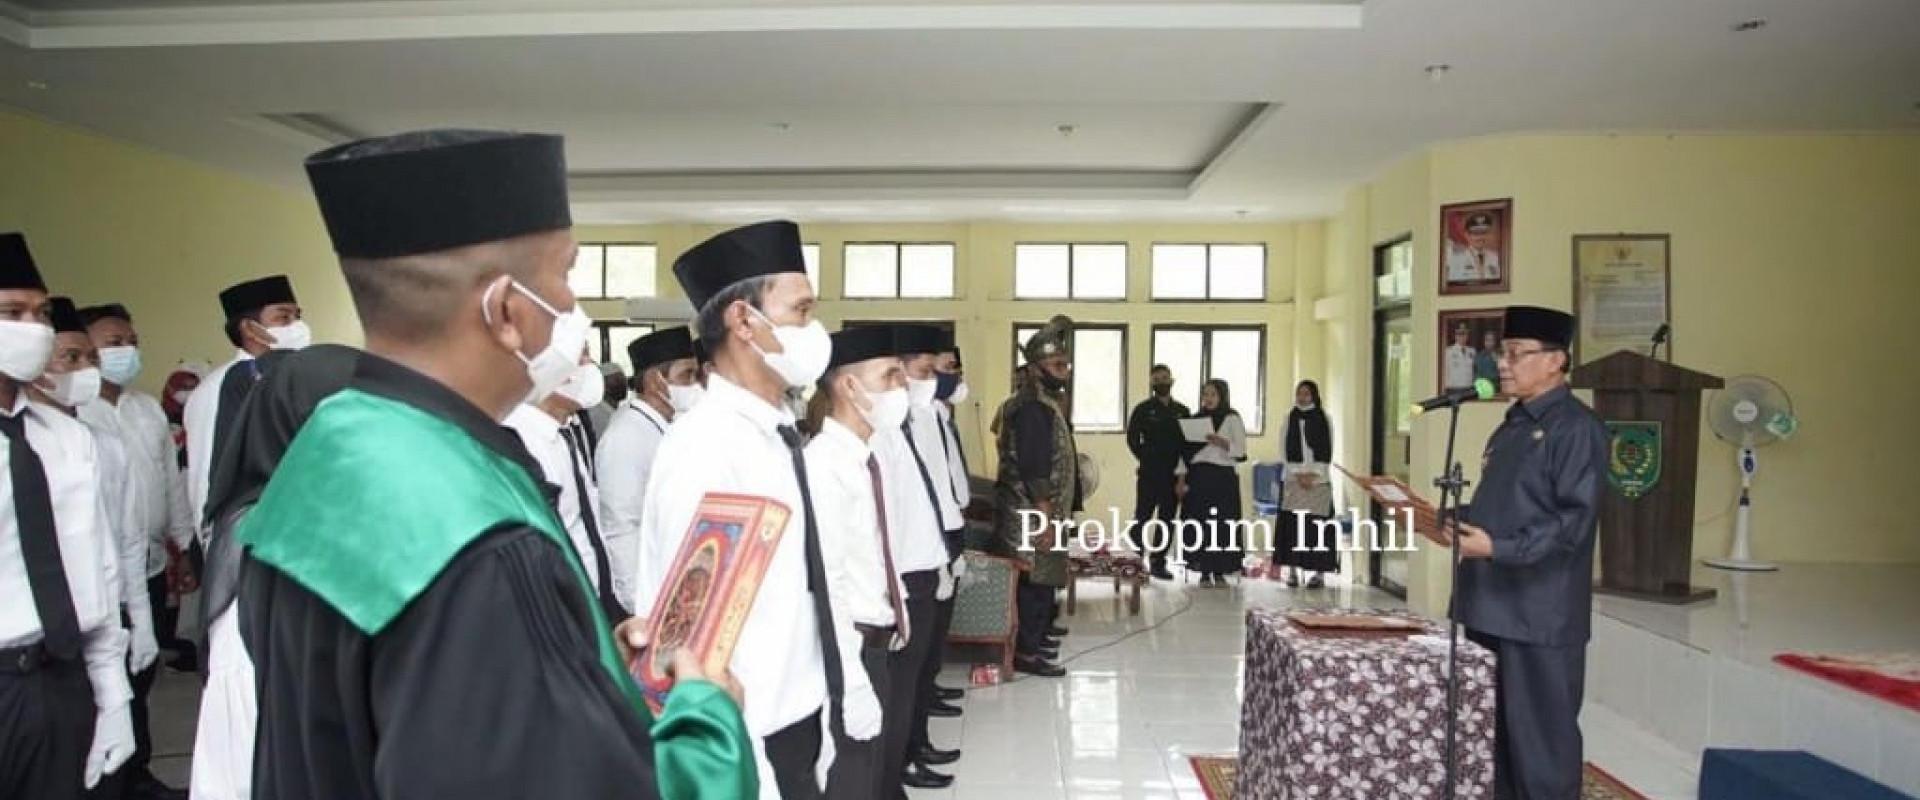 Bupati Inhil HM.Wardan resmikan Ketua Beserta Anggota BPD se Kecamatan Concong